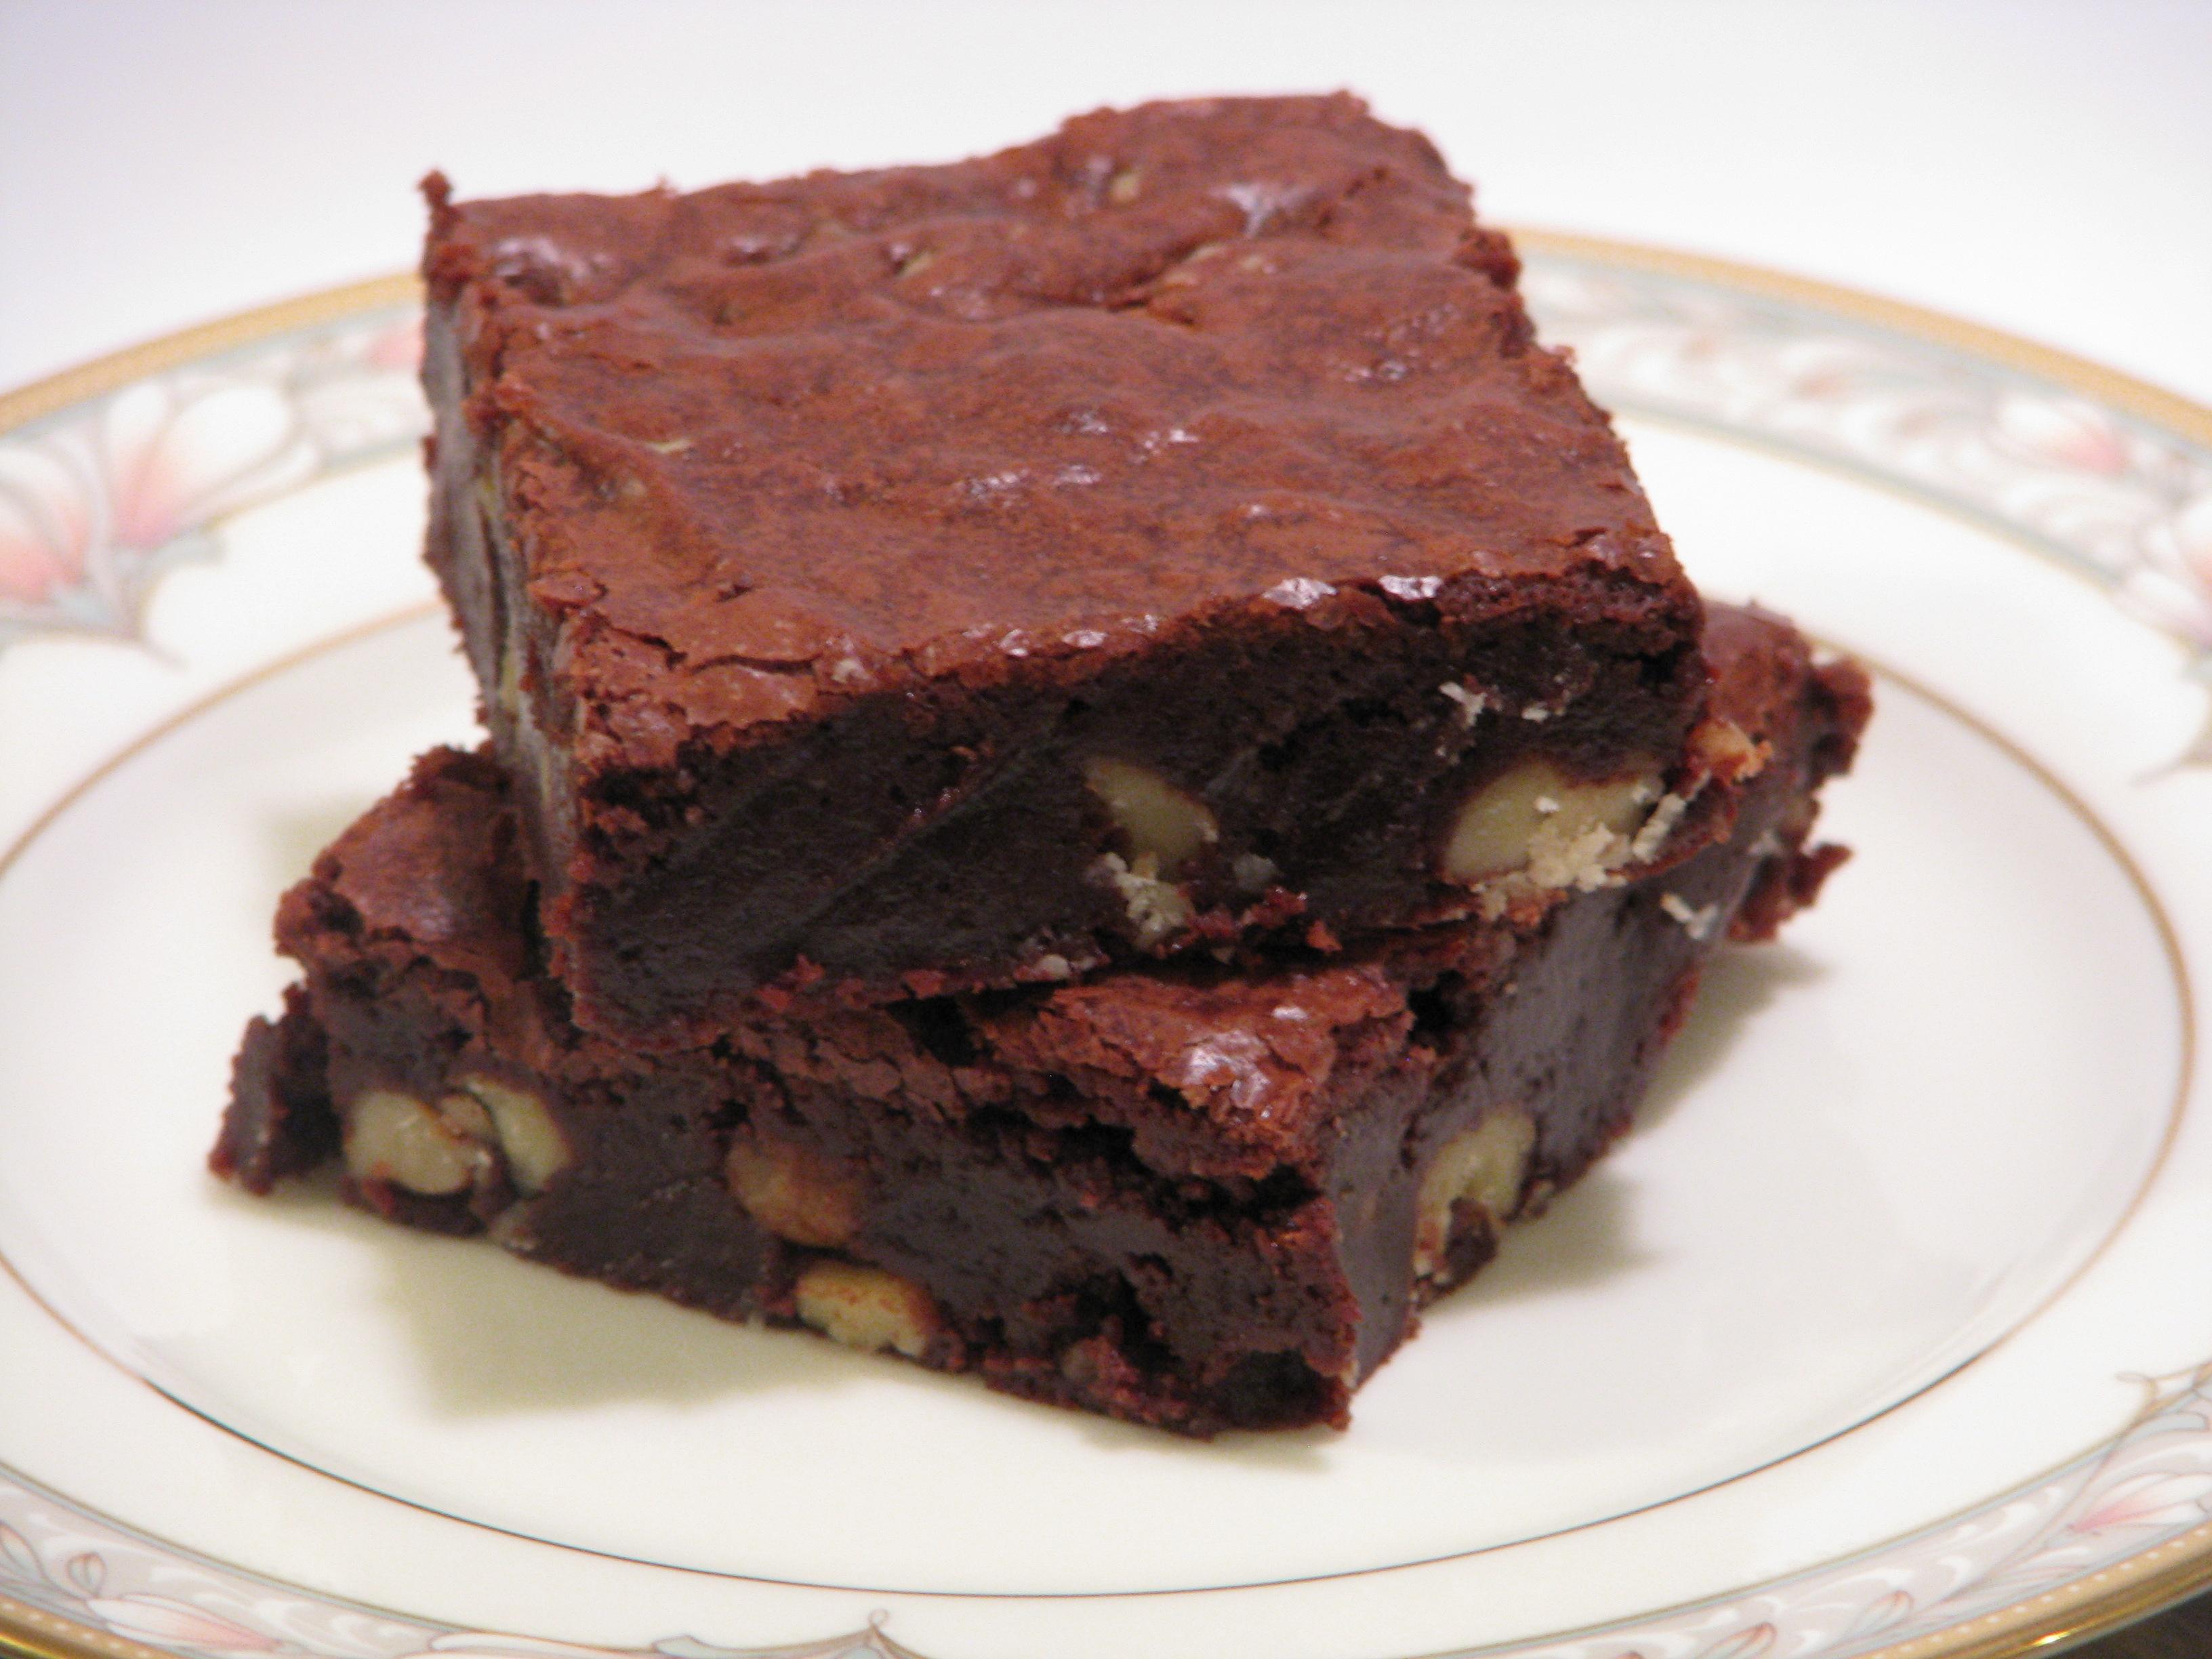 browned cocoa brownies with browned cocoa brownies with browned cocoa ...